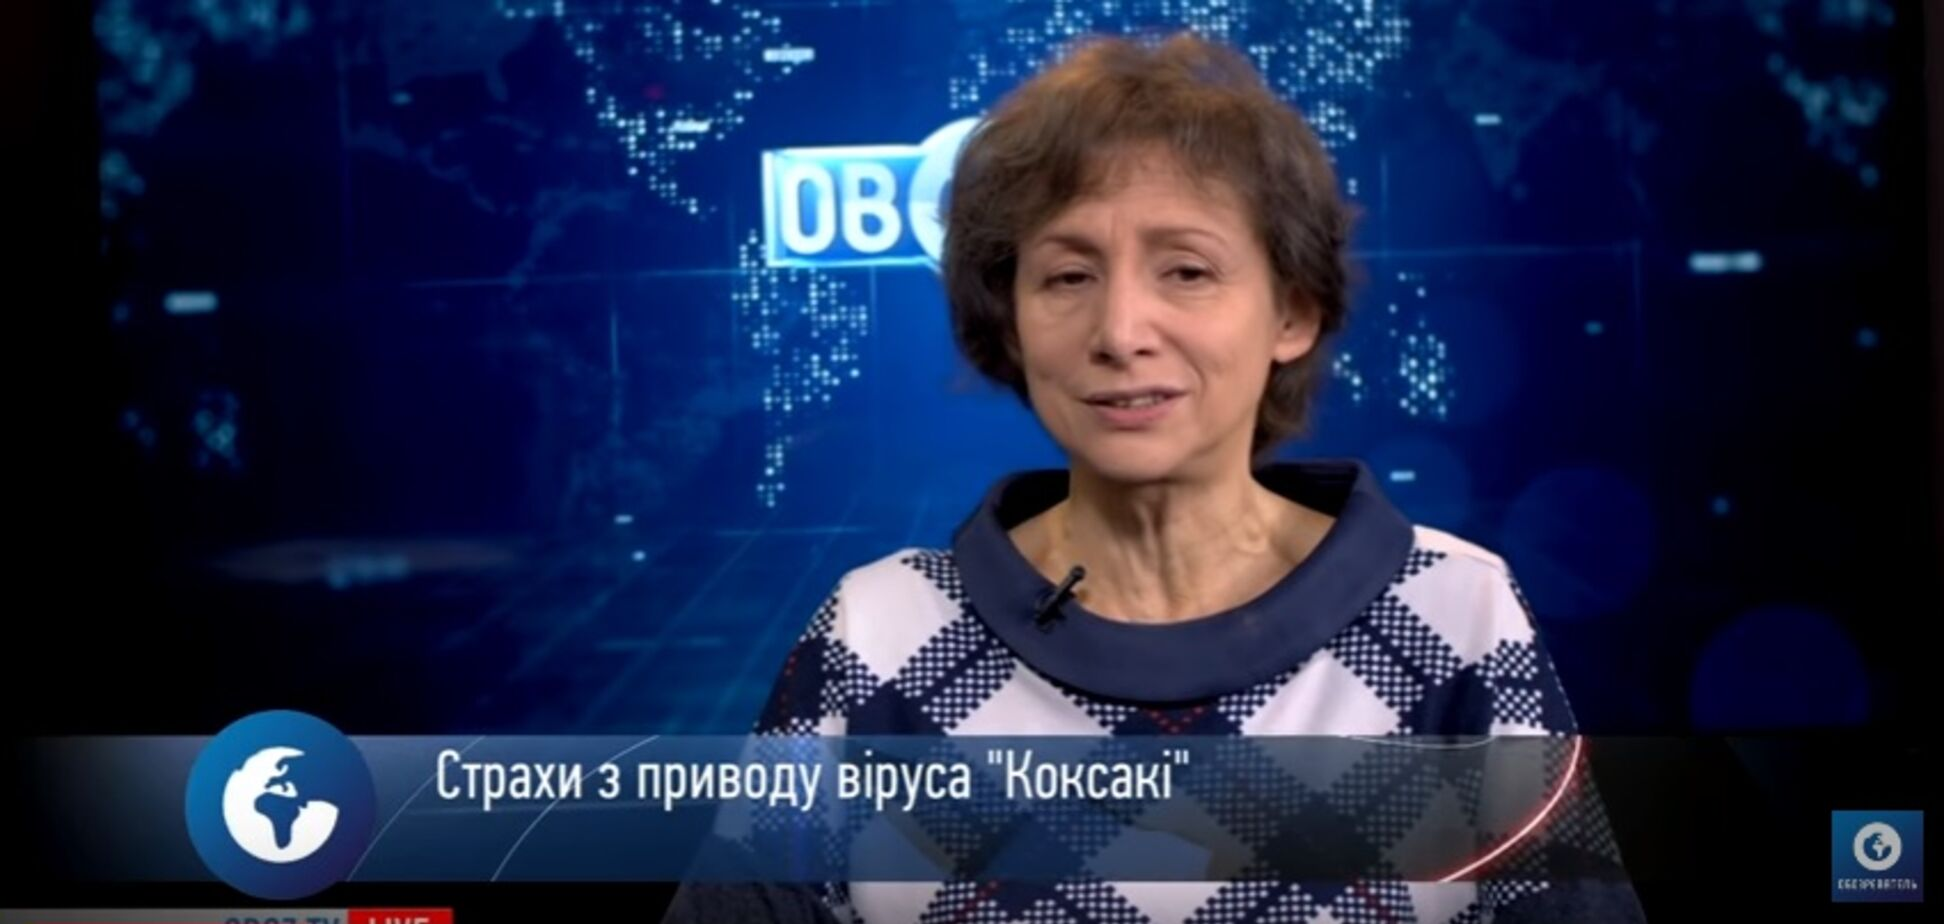 Вирус Коксаки в Украине: врач предупредил о новой тенденции